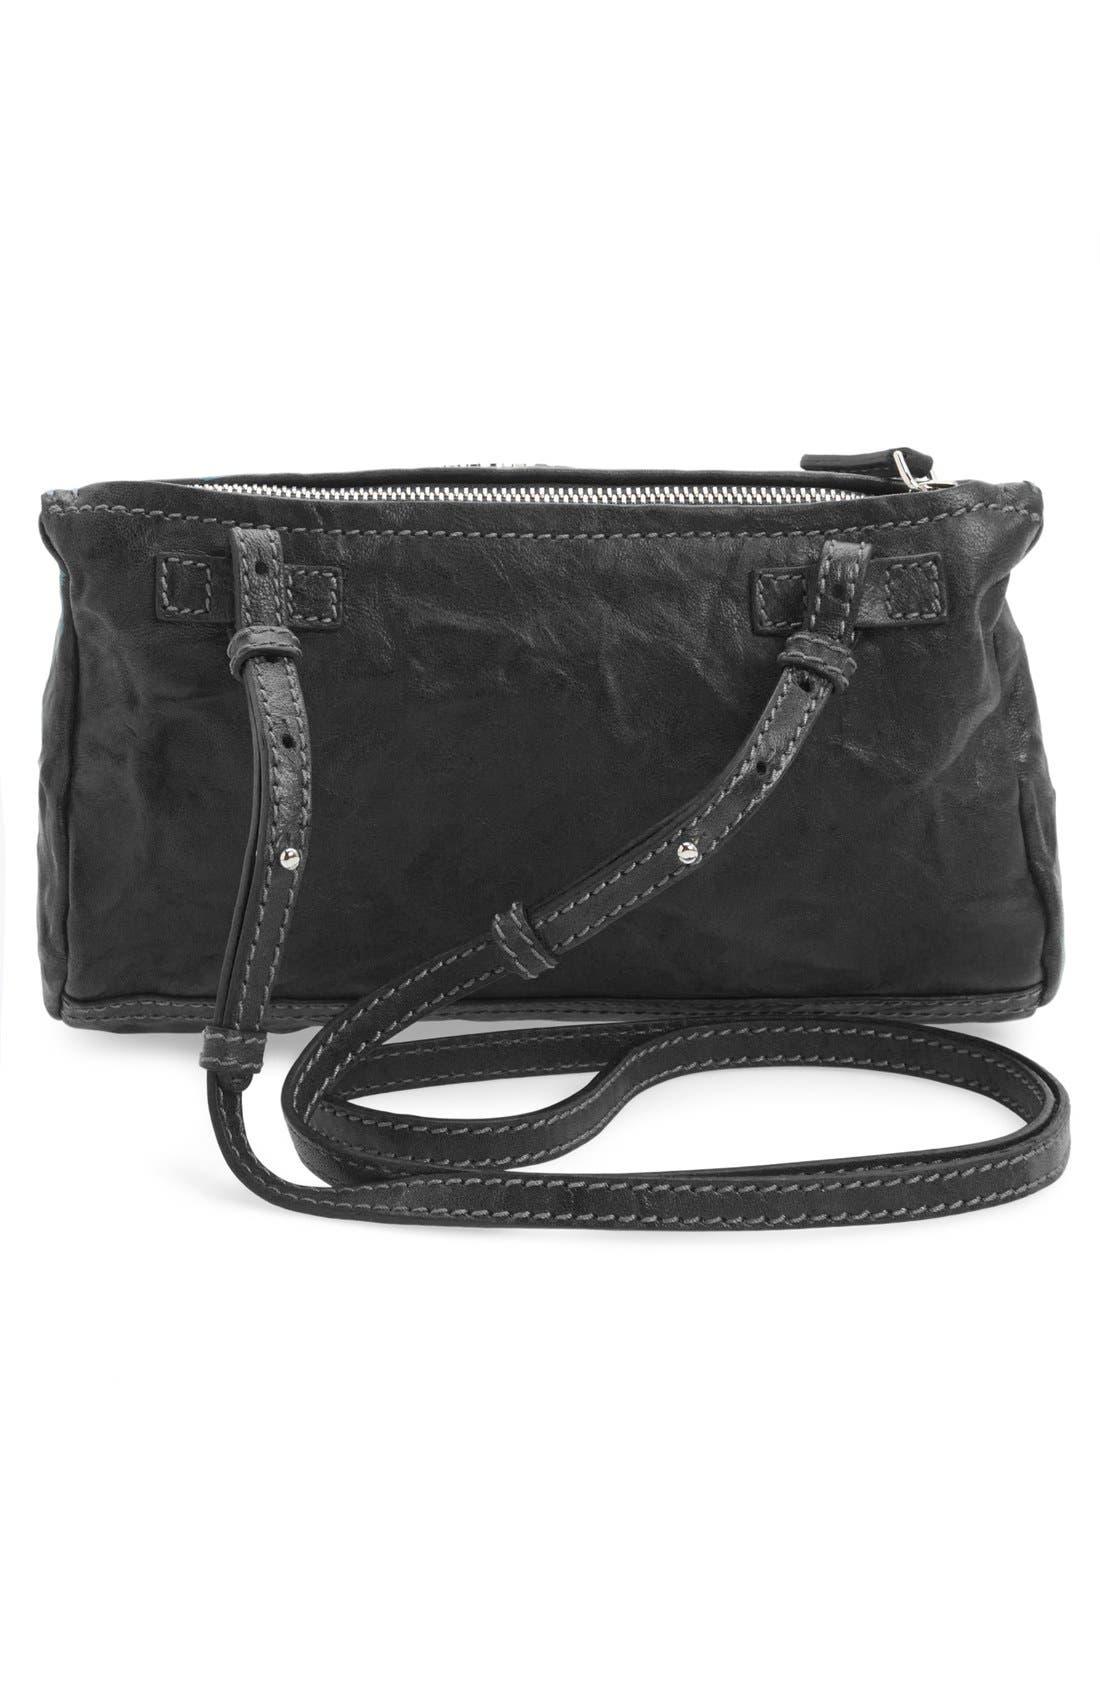 'Mini Pepe Pandora' Leather Shoulder Bag,                             Alternate thumbnail 6, color,                             BLACK